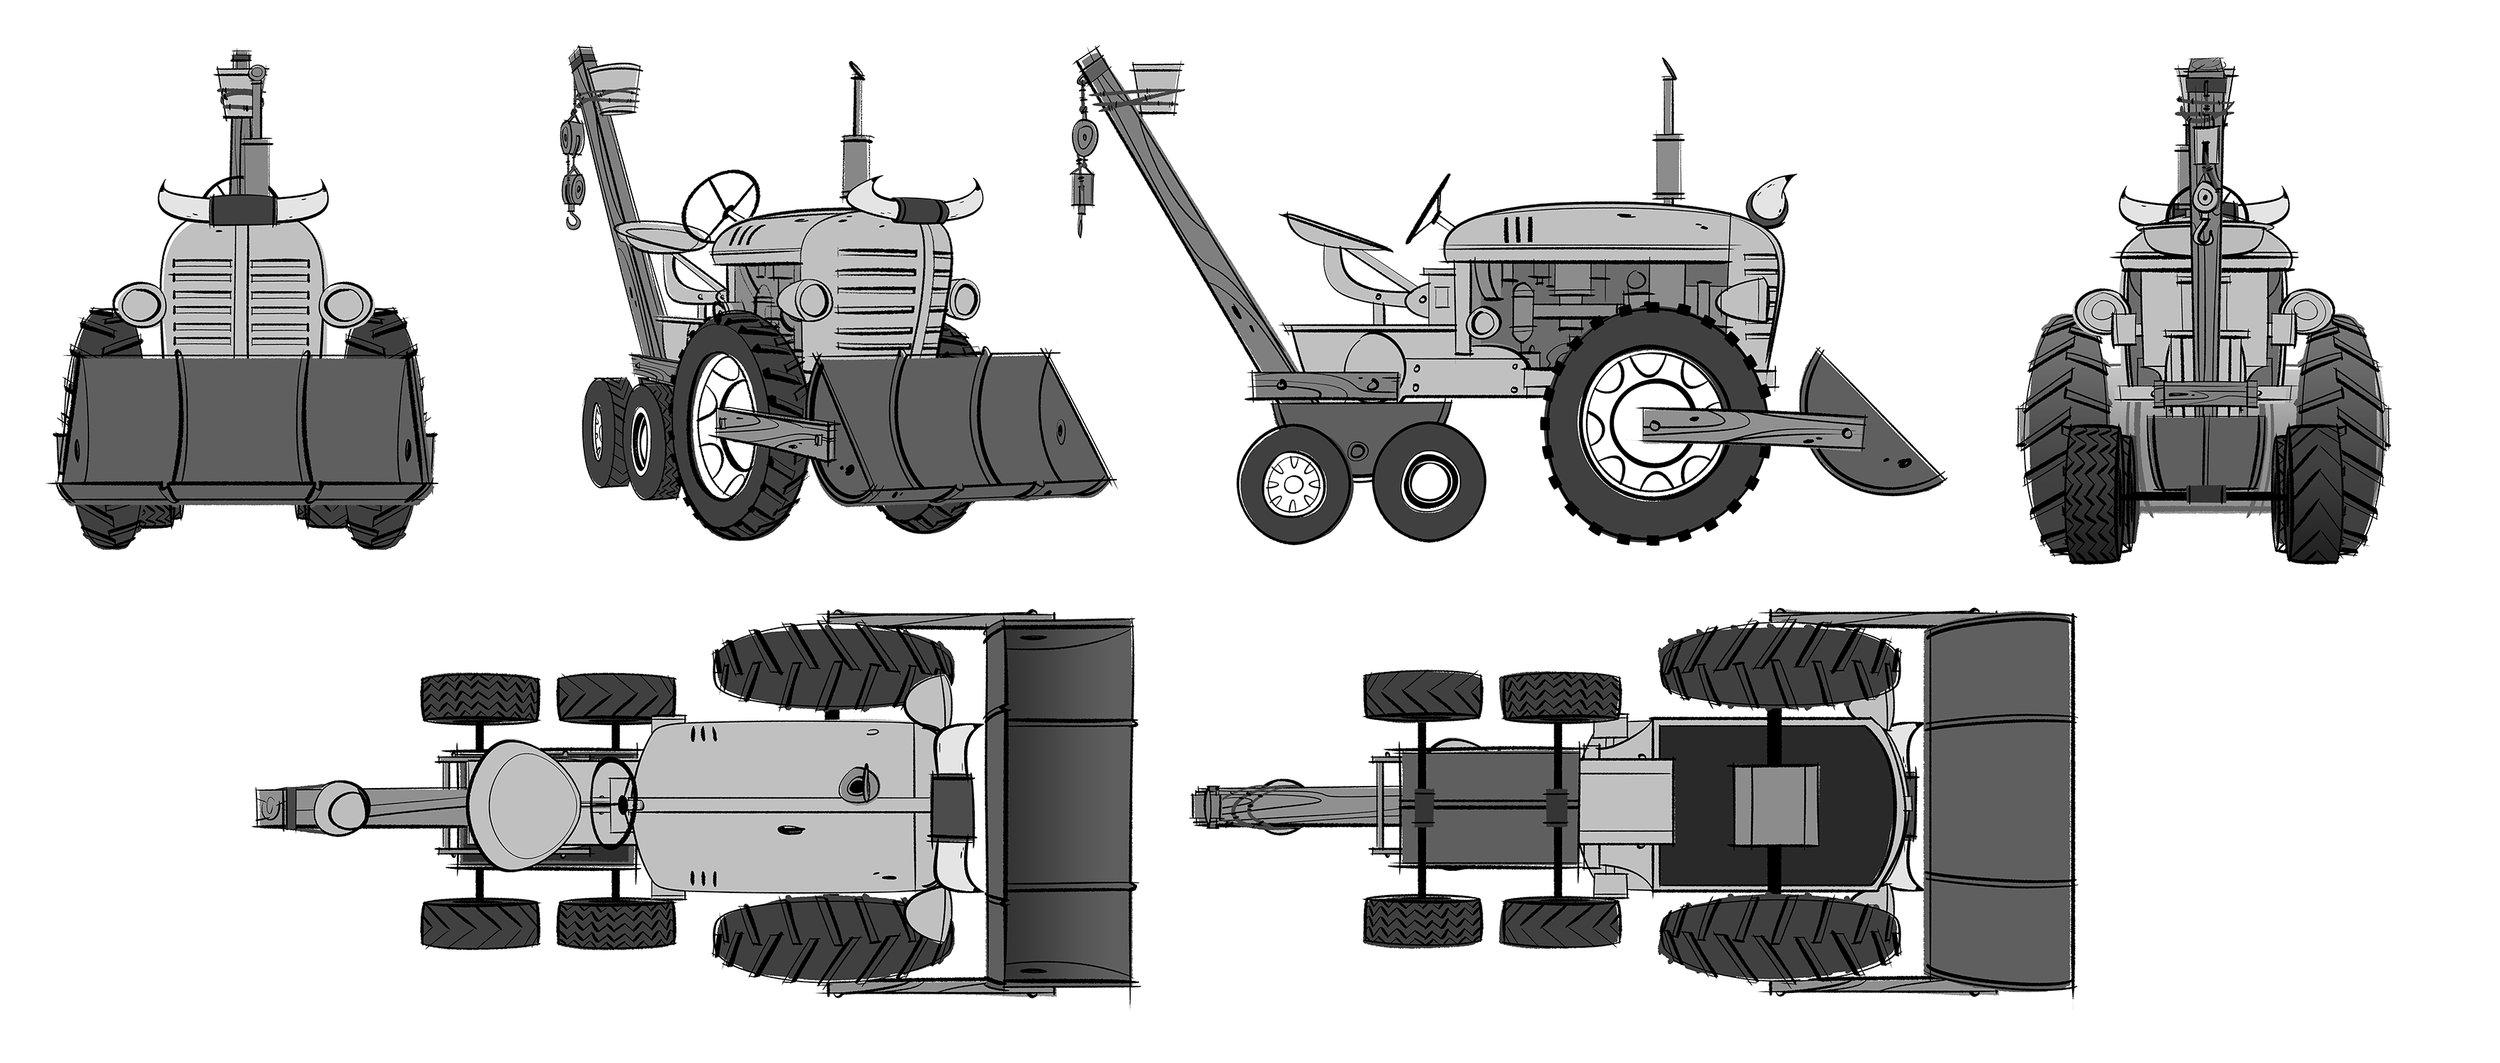 mickey_tractor_dozer_turnaround.jpg